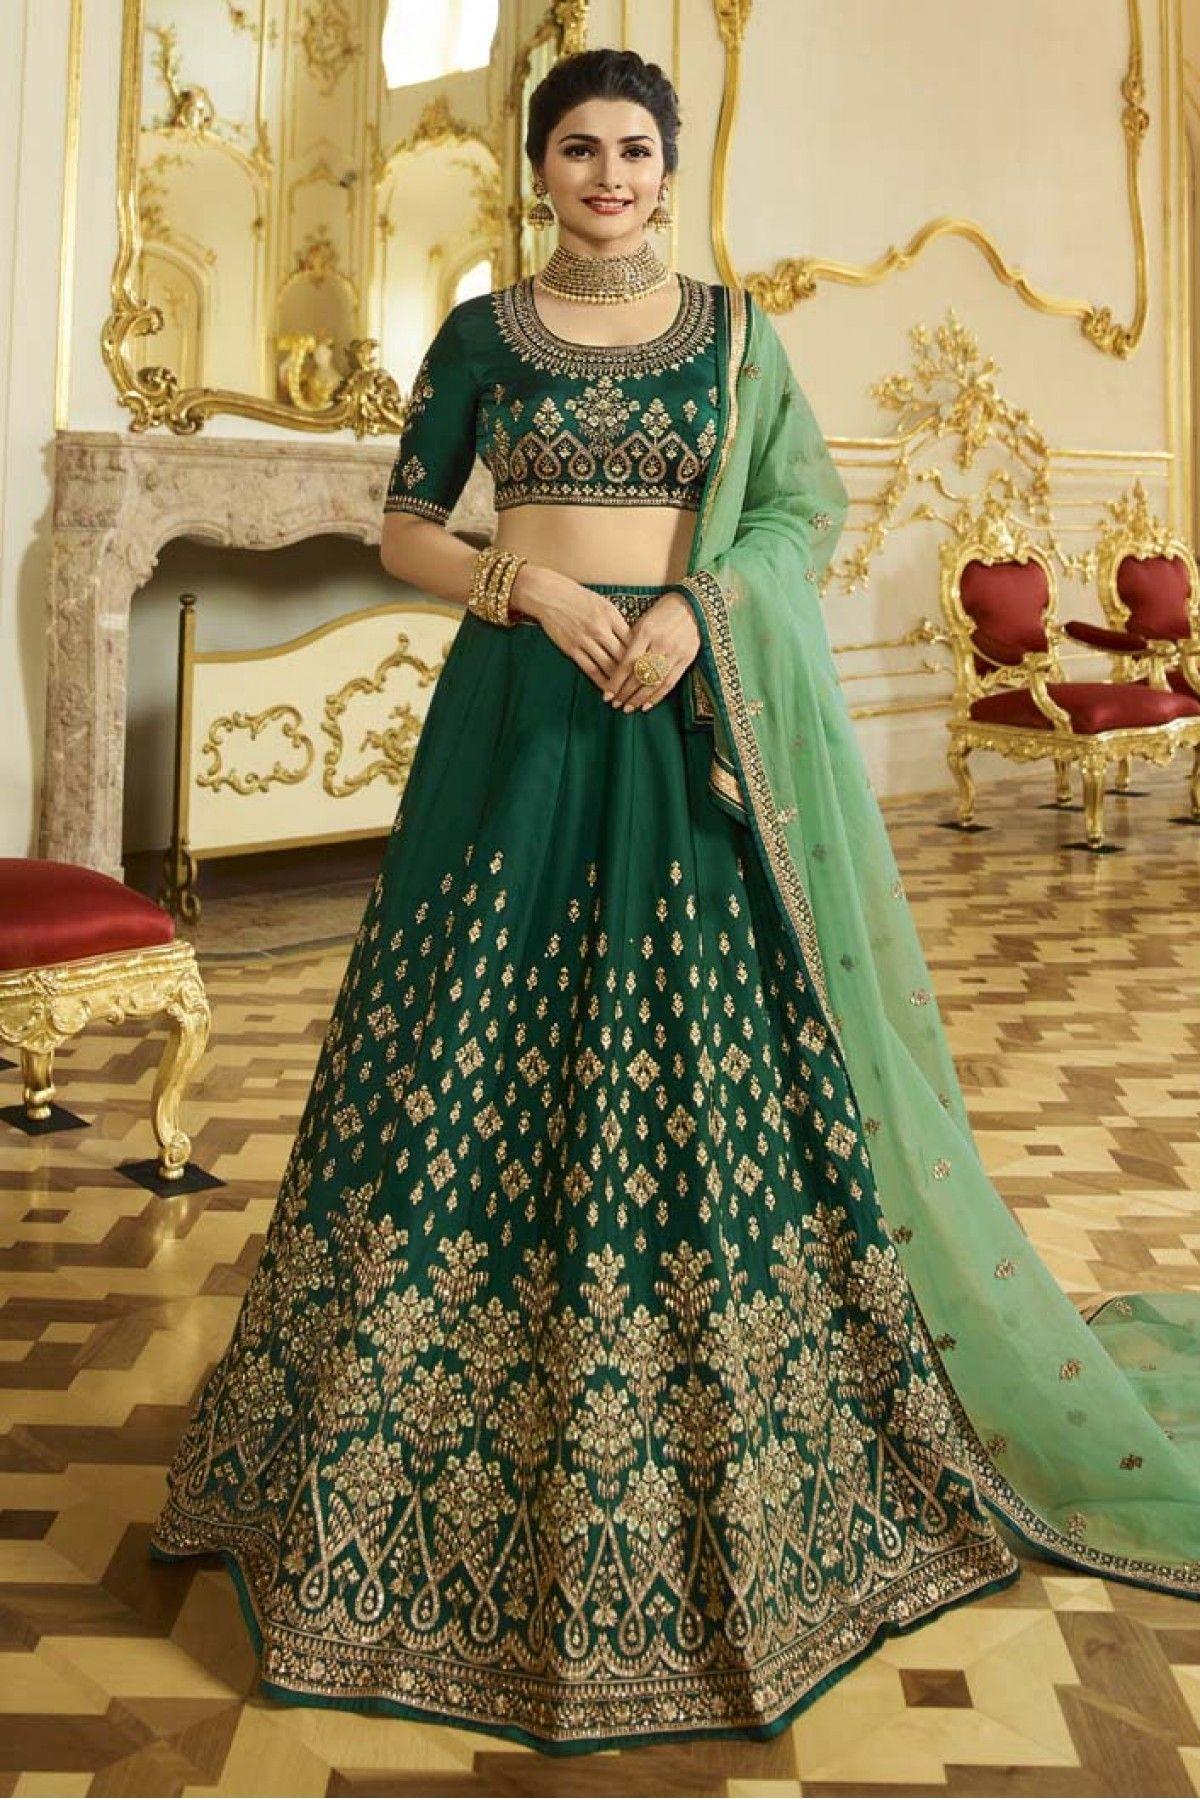 Heavy designer lehenga choli for women,green color wedding,bridal,party wear lengha sari,mahedi function ghagra choli for girls